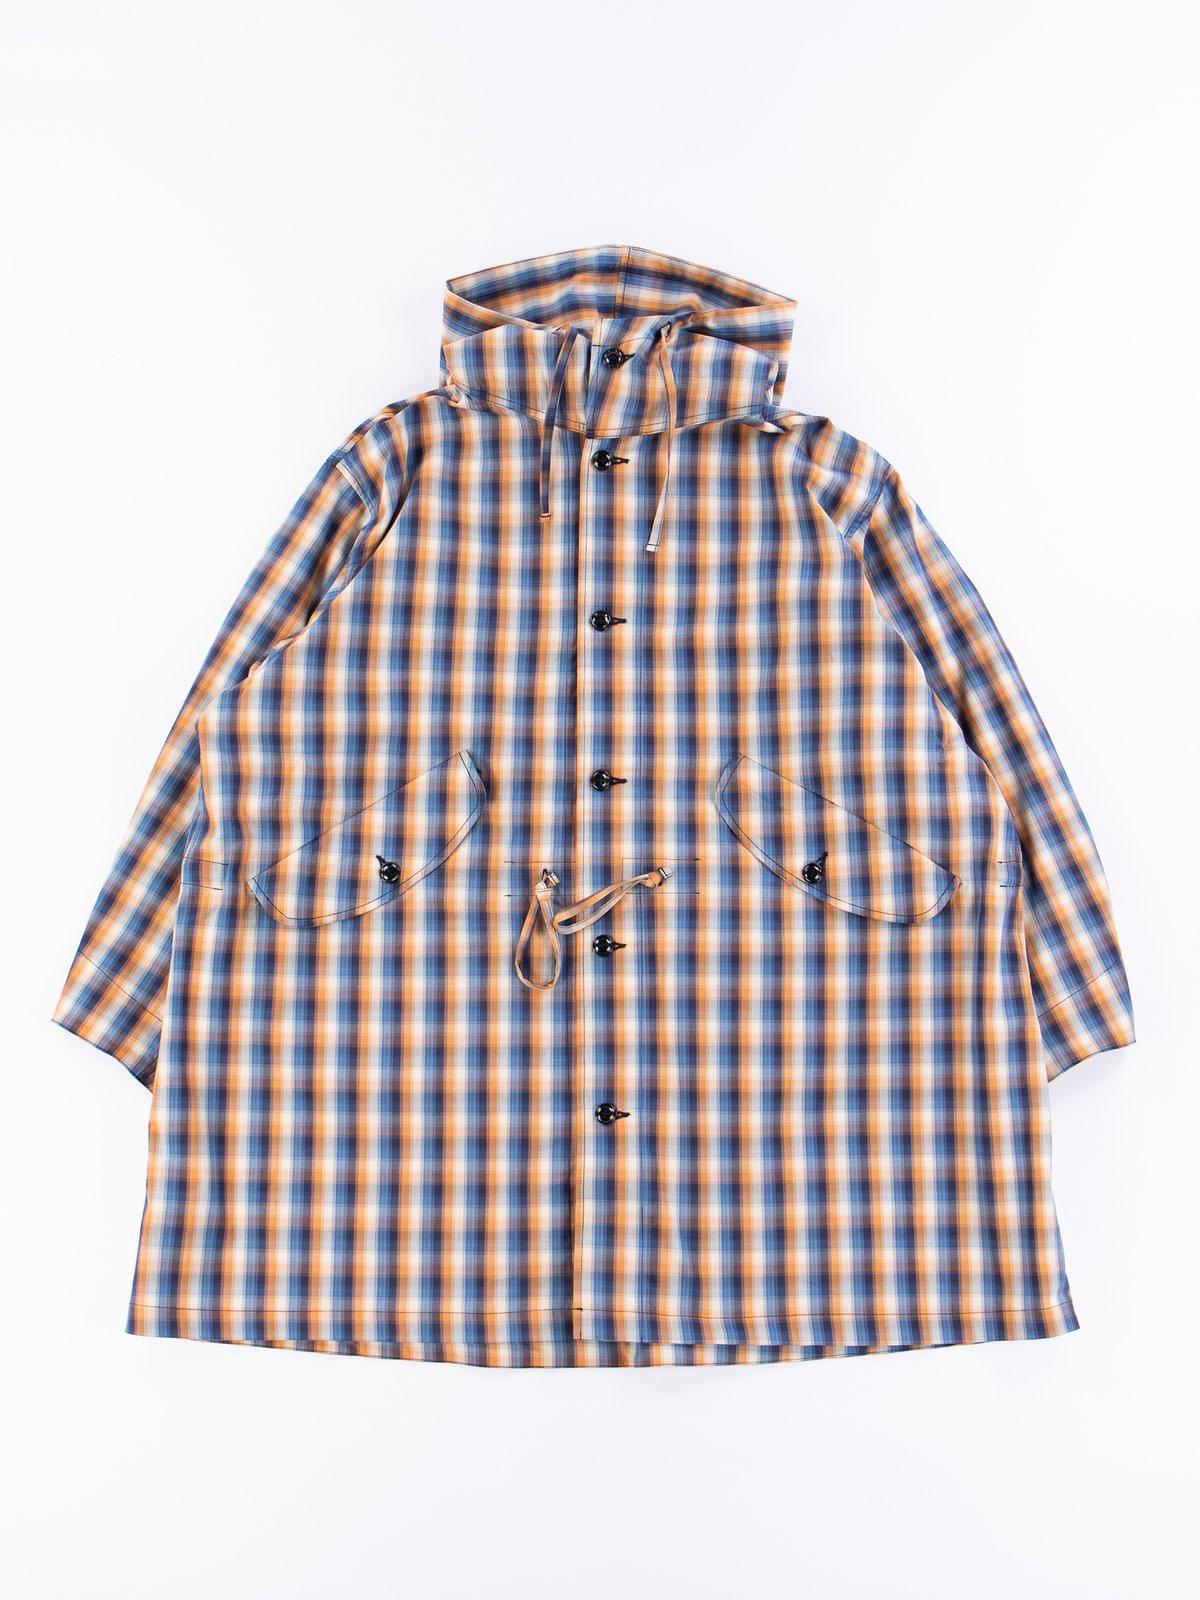 Blue/Orange Plaid Oxford Vancloth Czech Coat by Monitaly